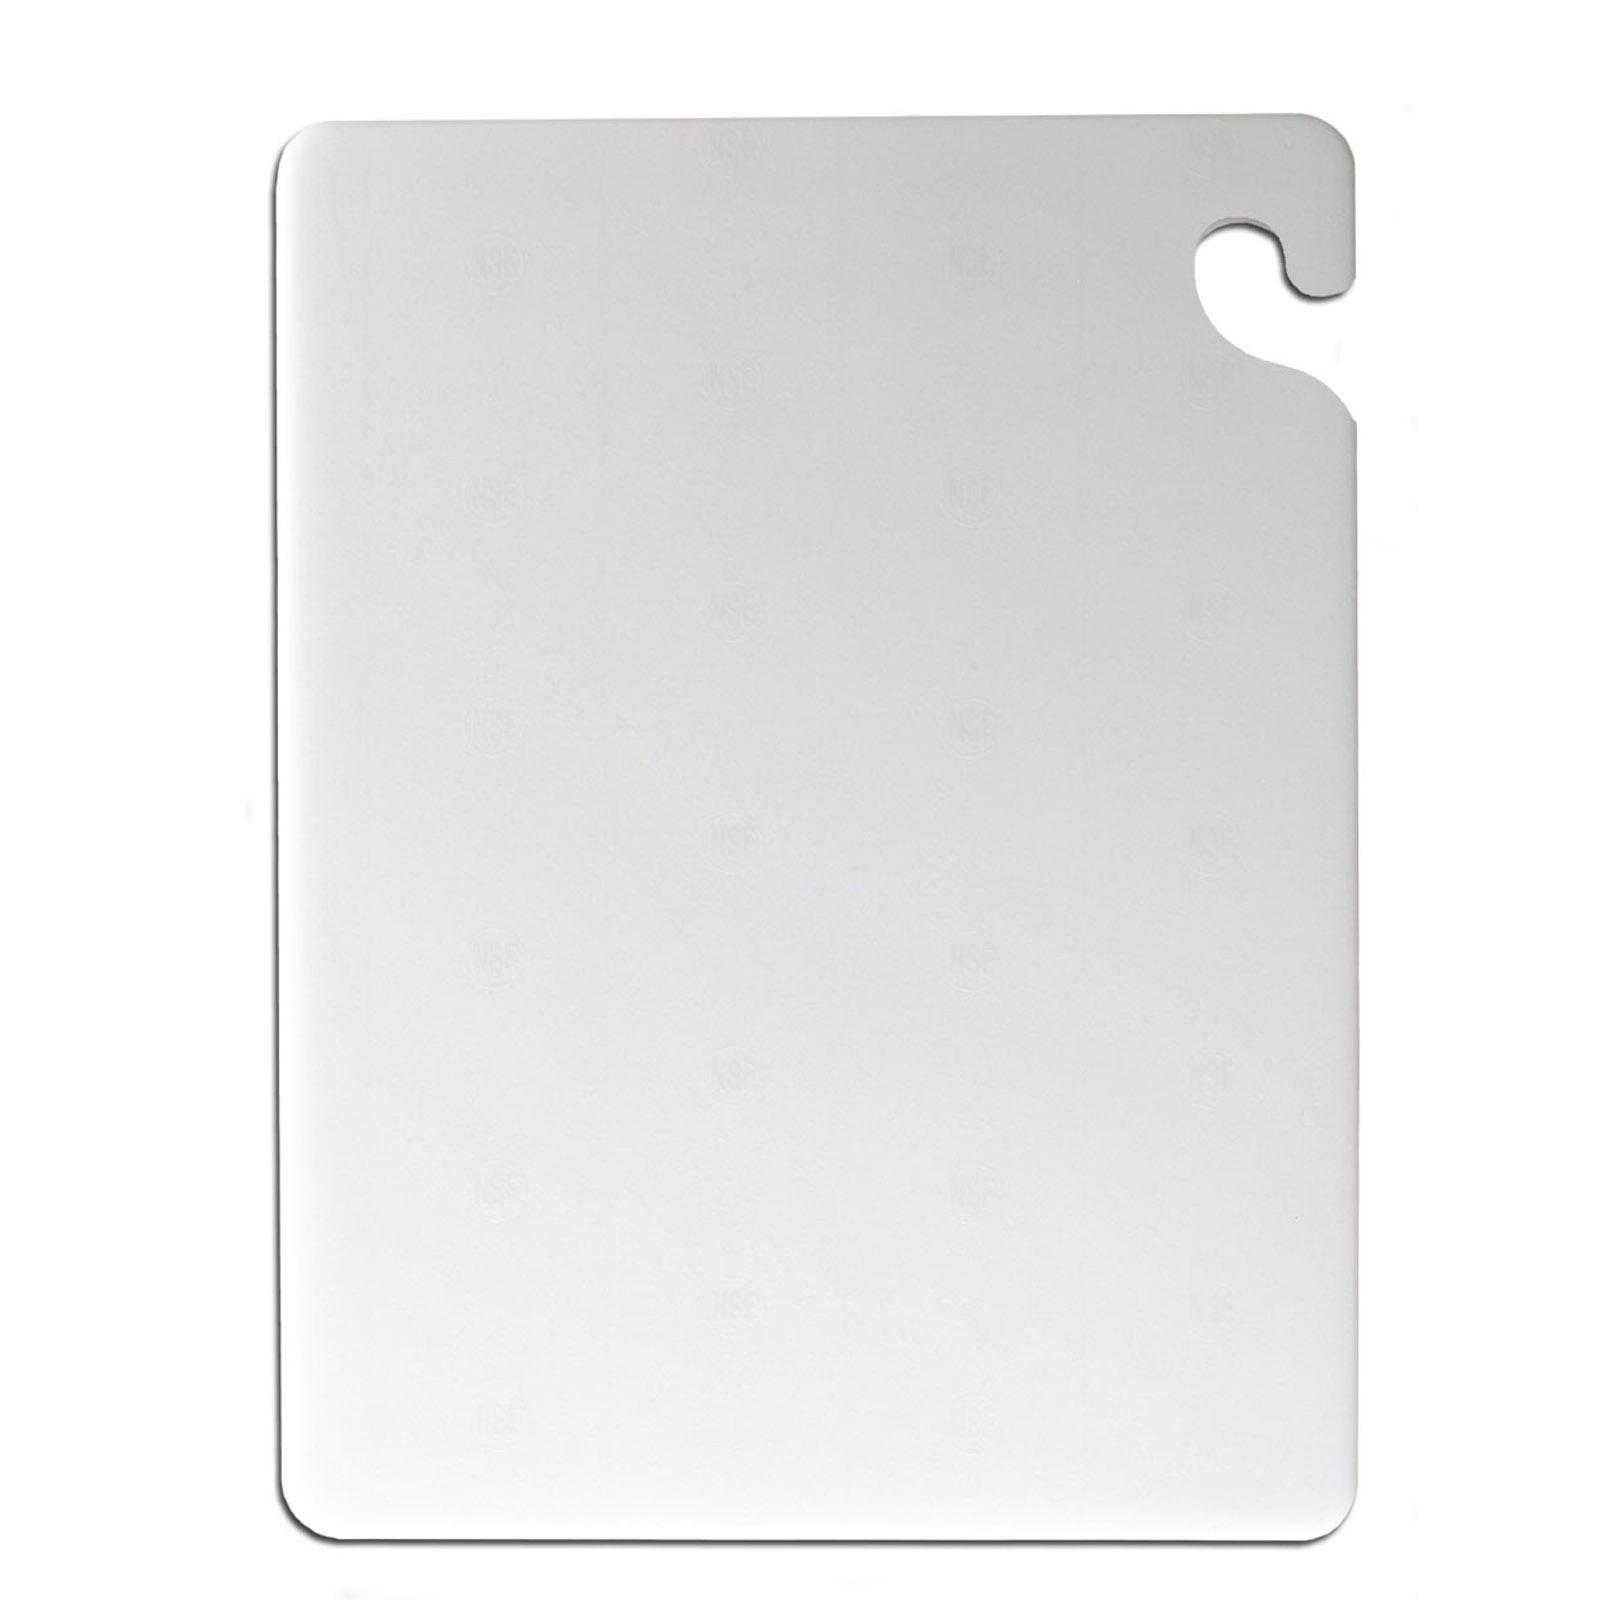 San Jamar CB182412WH cutting board, plastic